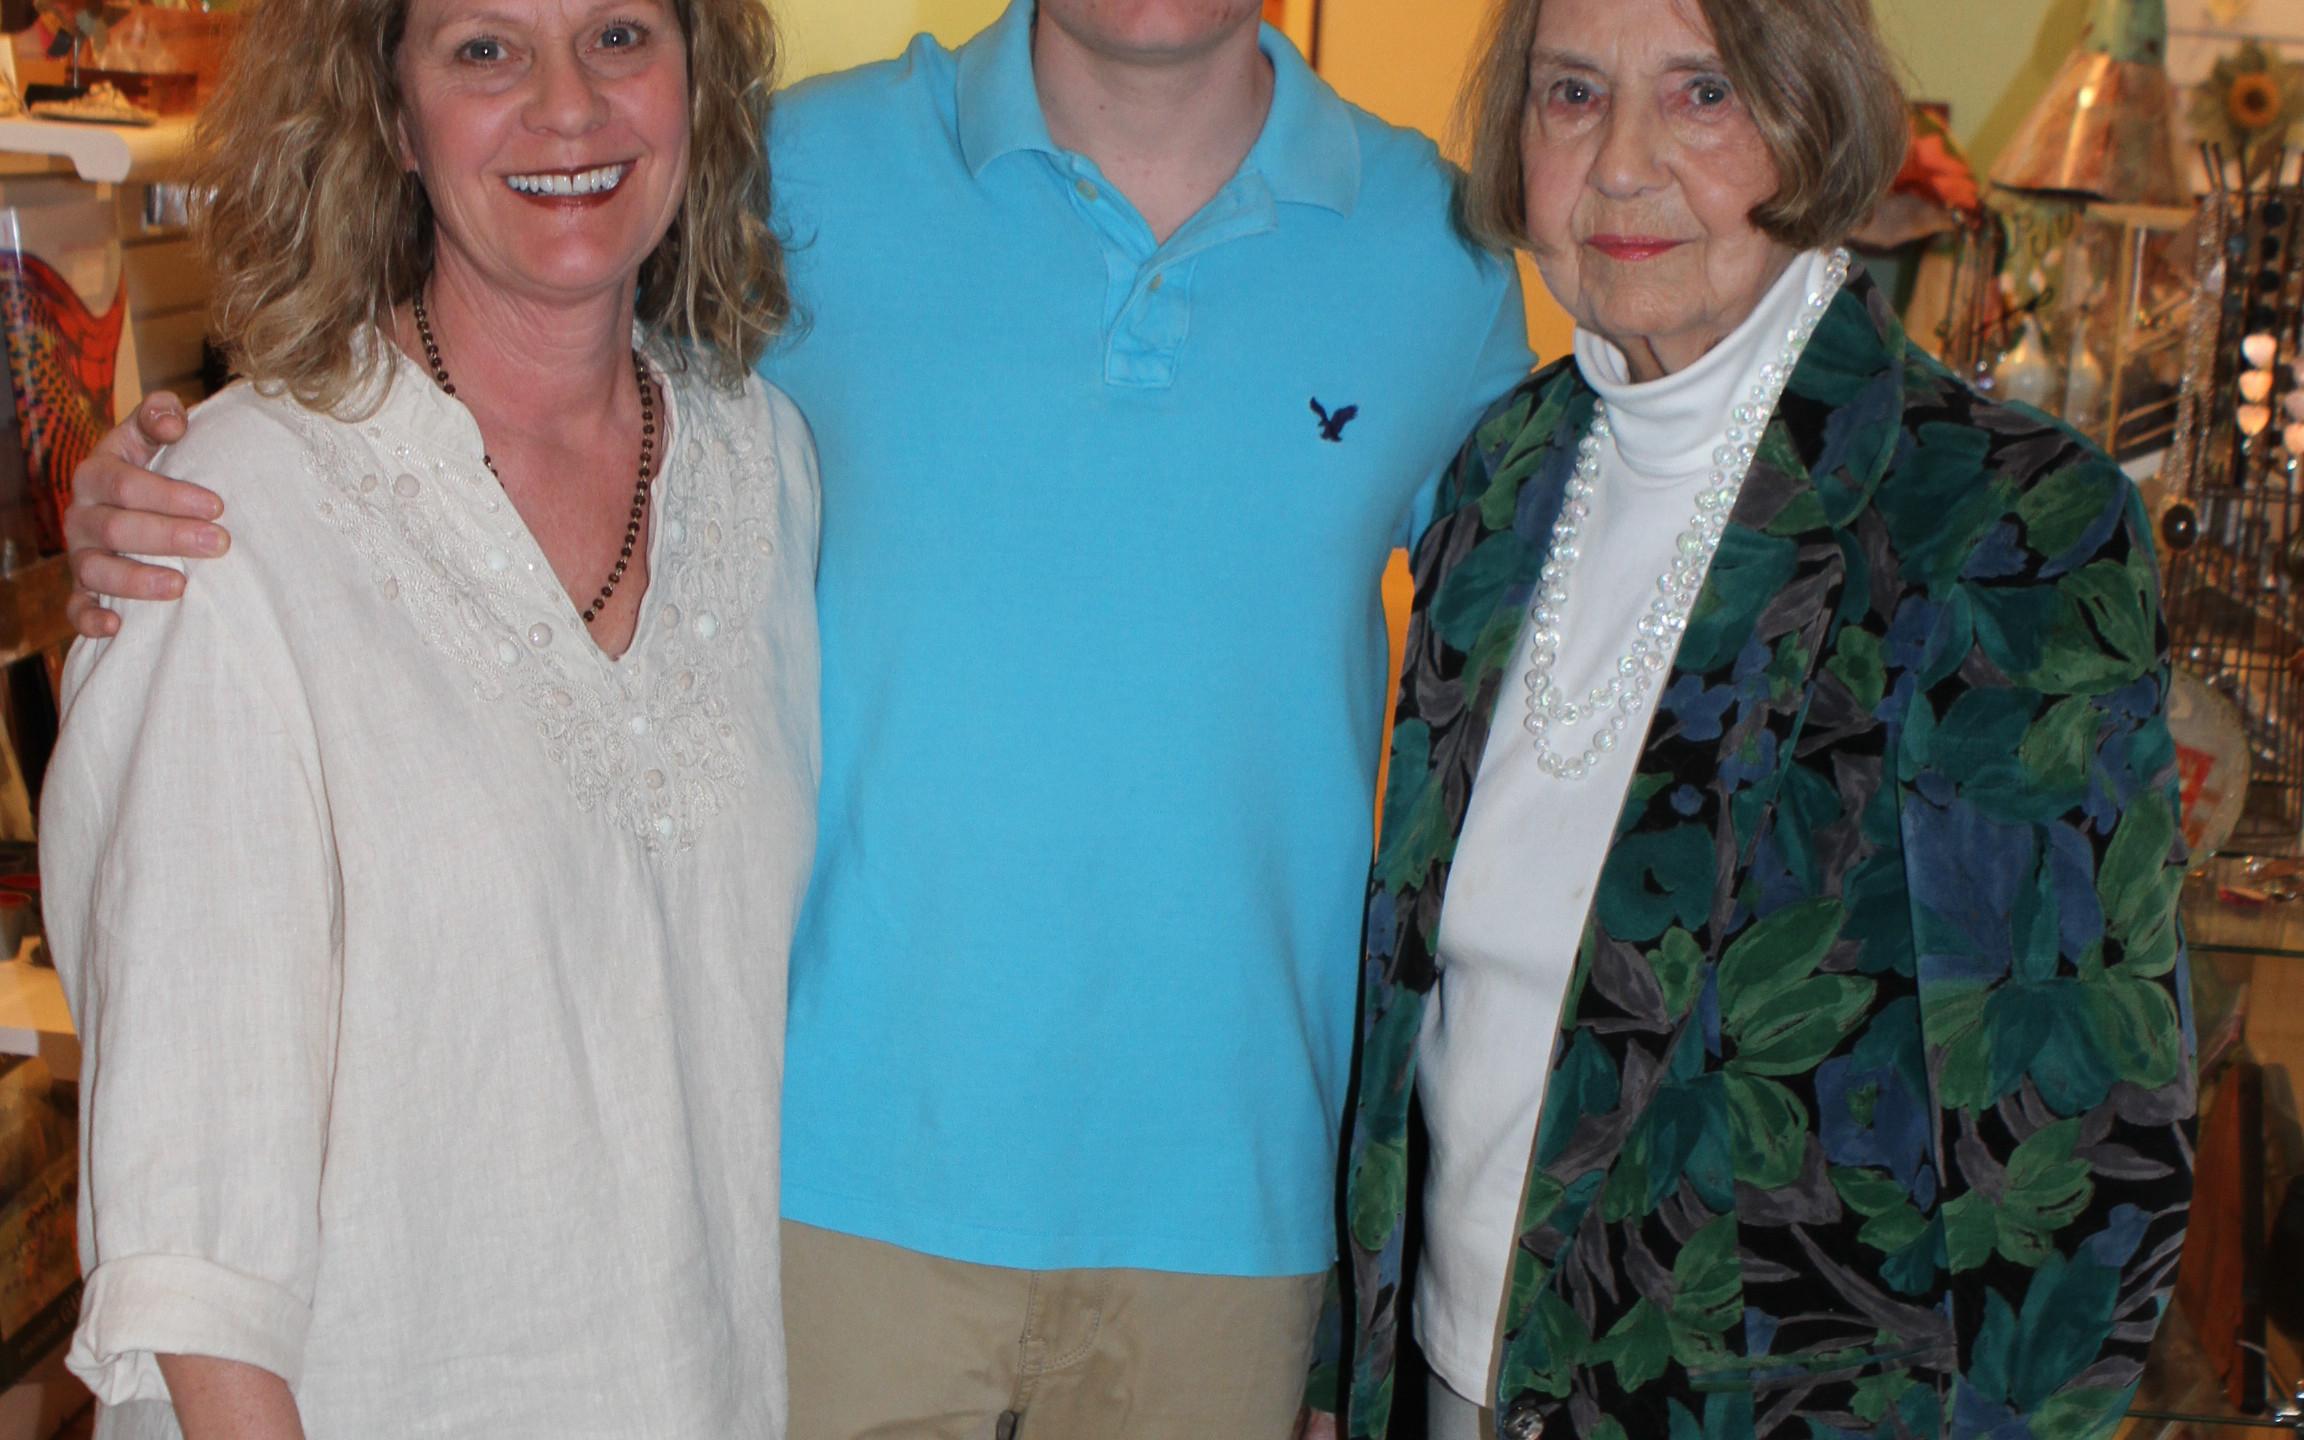 Christina & Daniel Parker, Shirley Teach Johnson